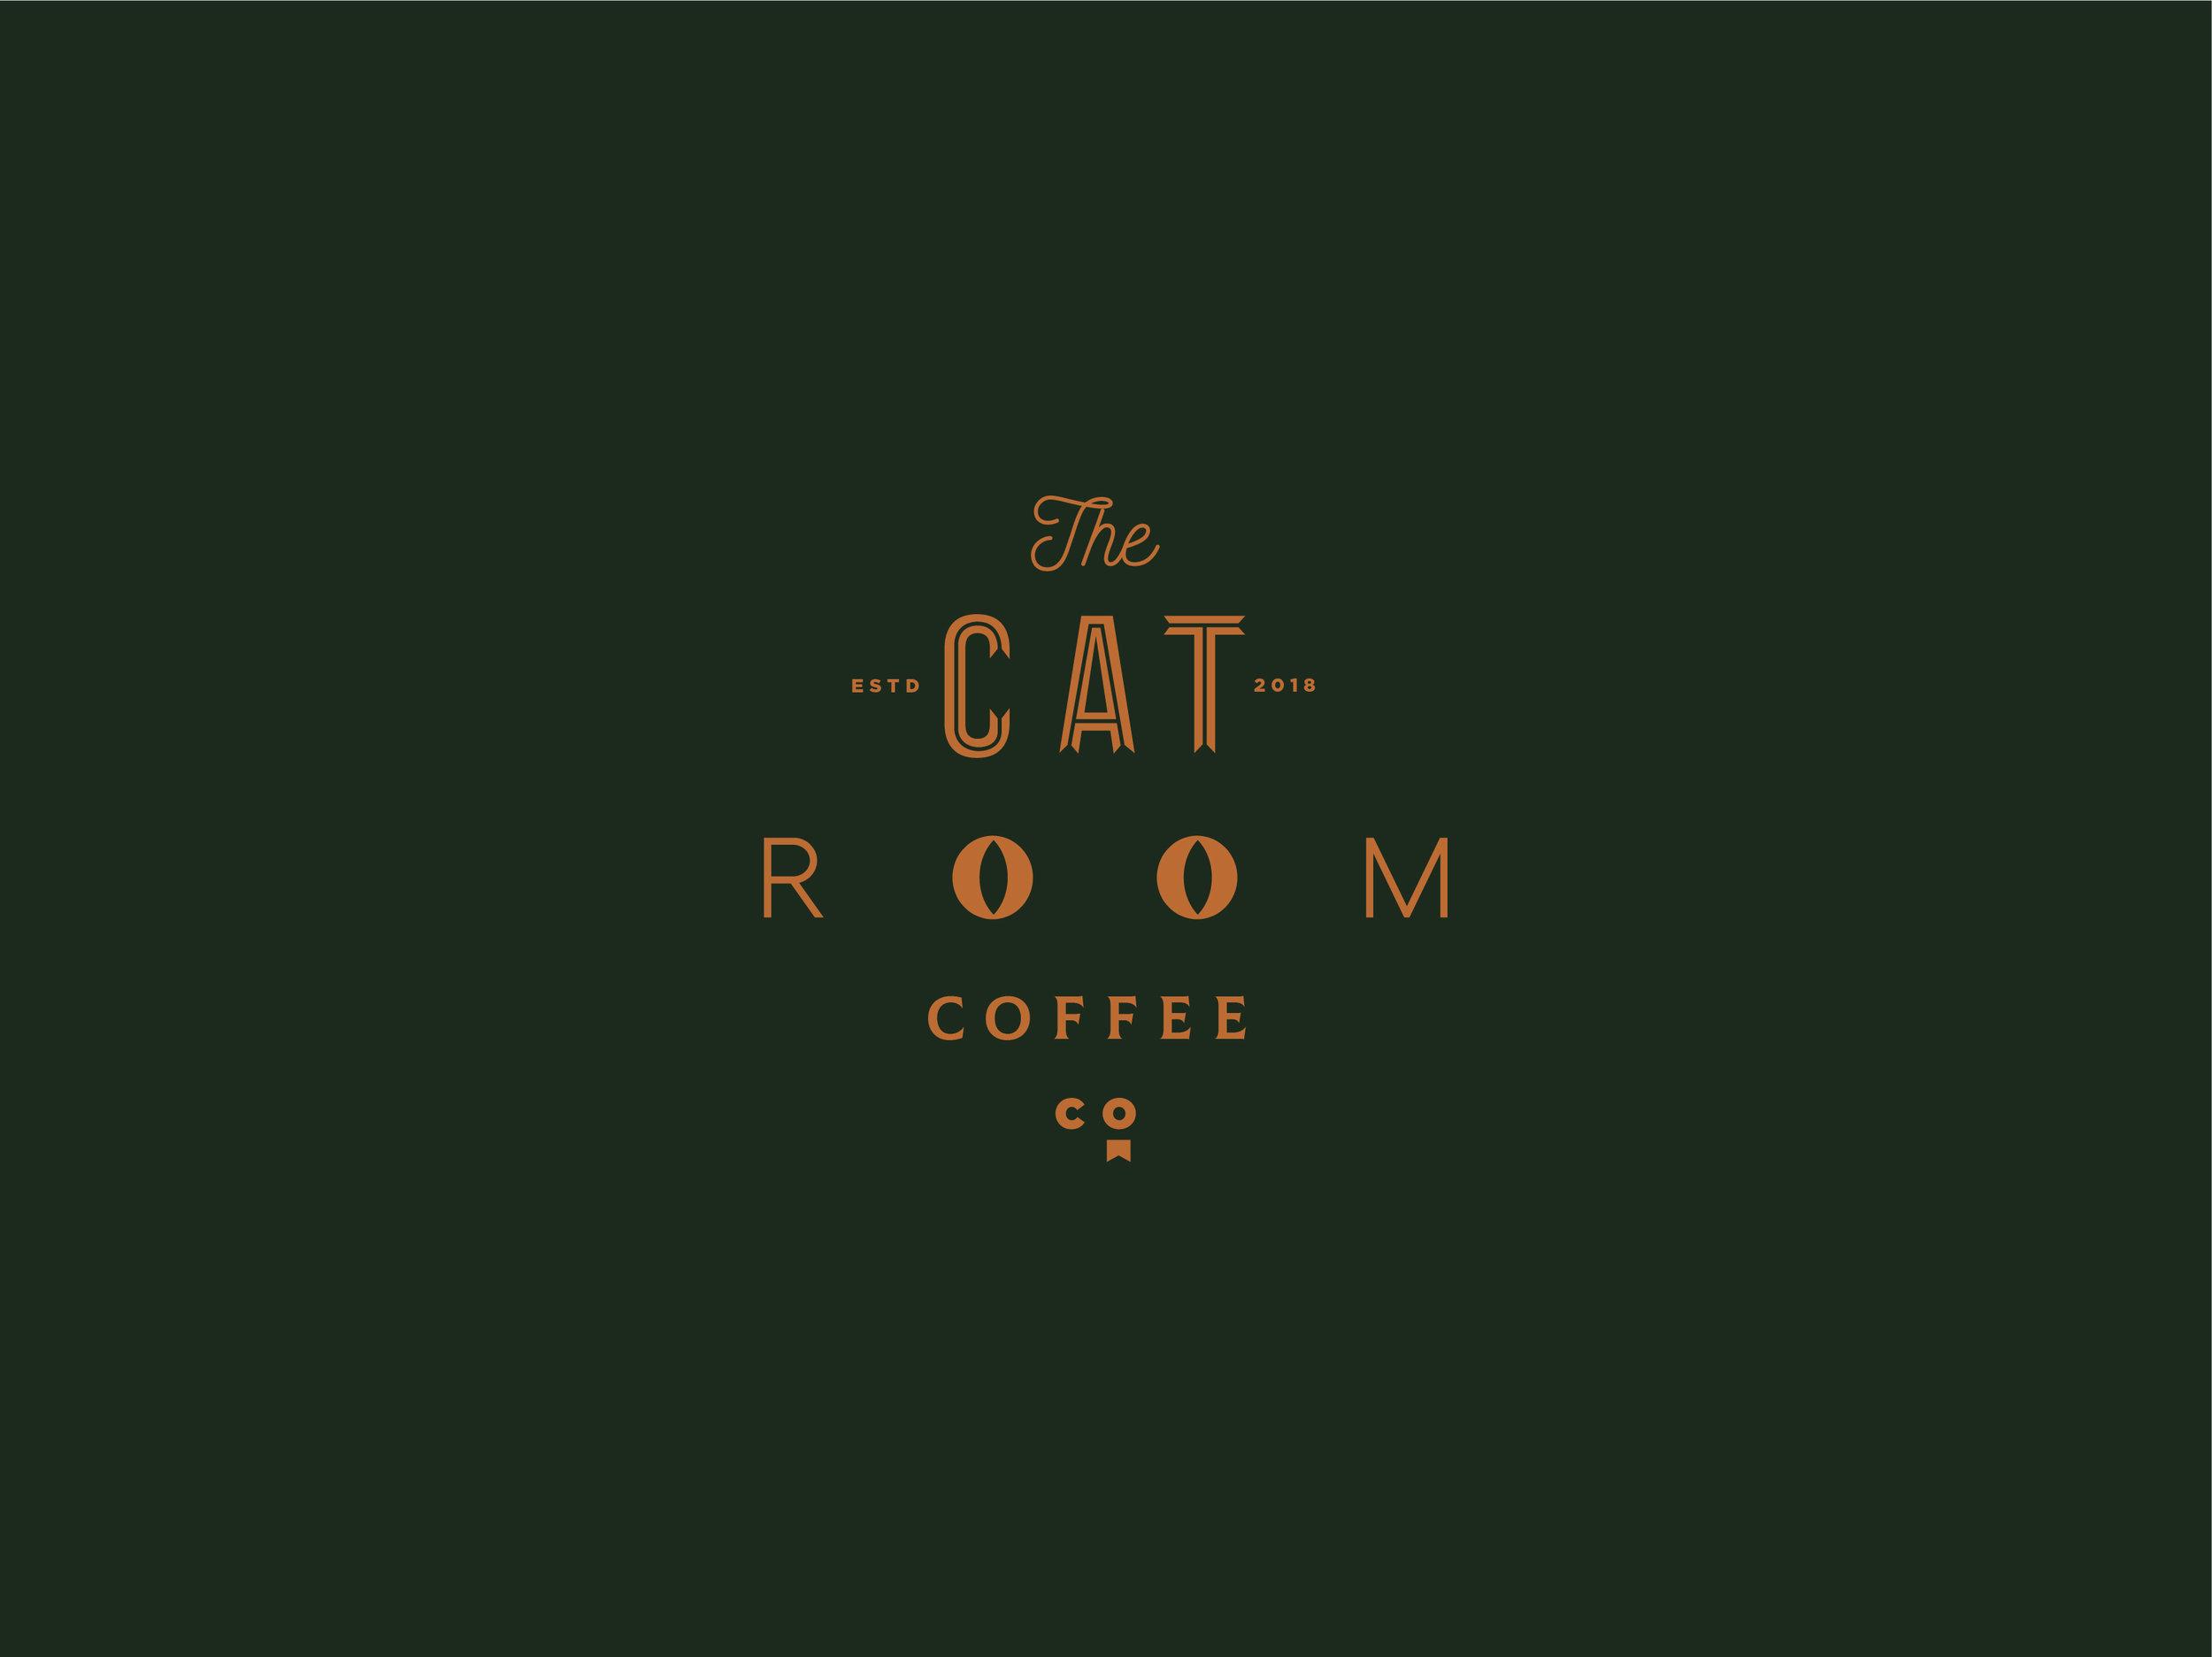 Jorge Campozano Studio - The Cat Room Coffee1.jpg